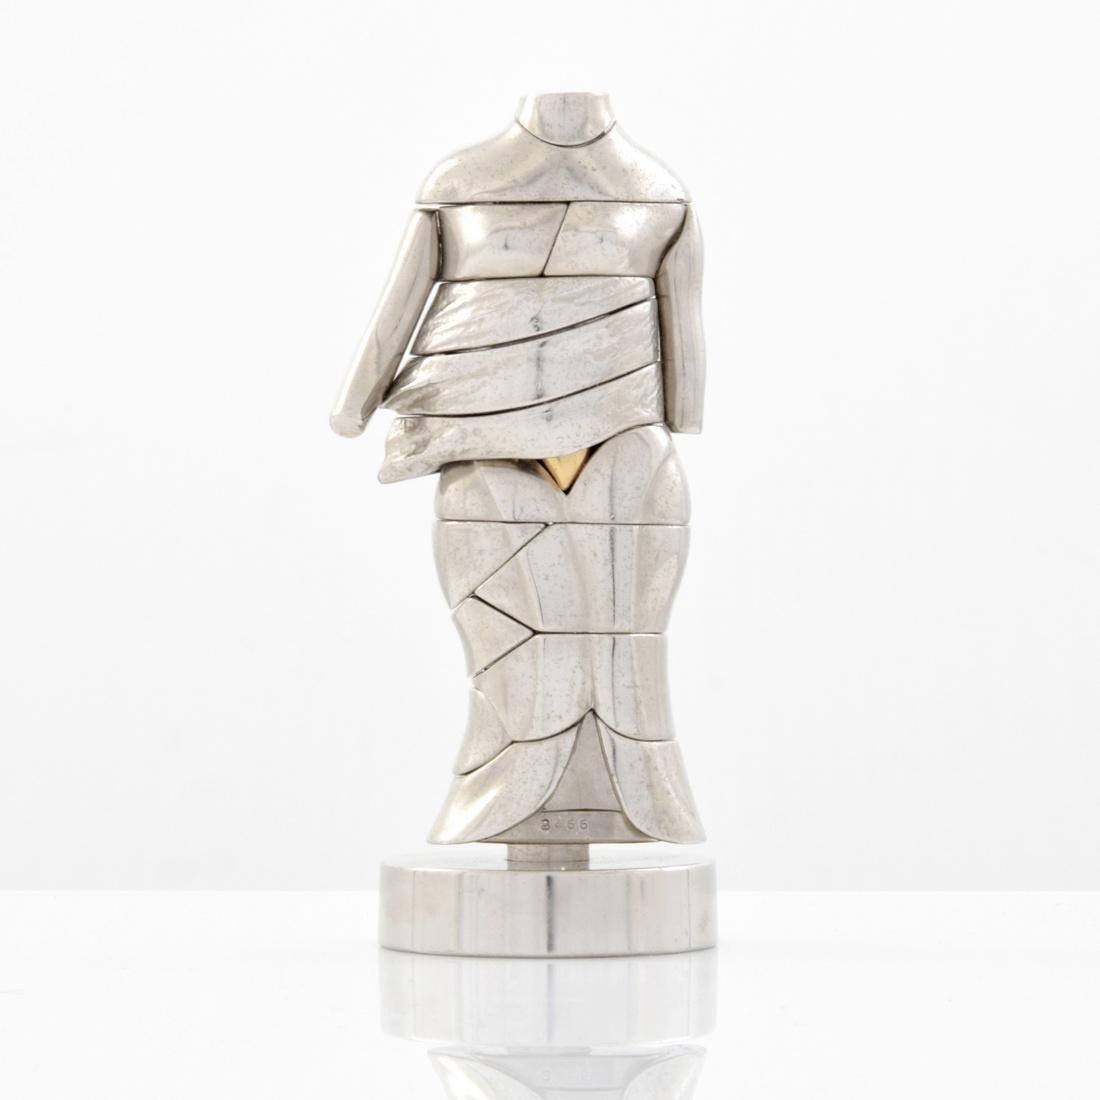 Miguel Berrocal MINI CARIATIDE Sculpture/Puzzle